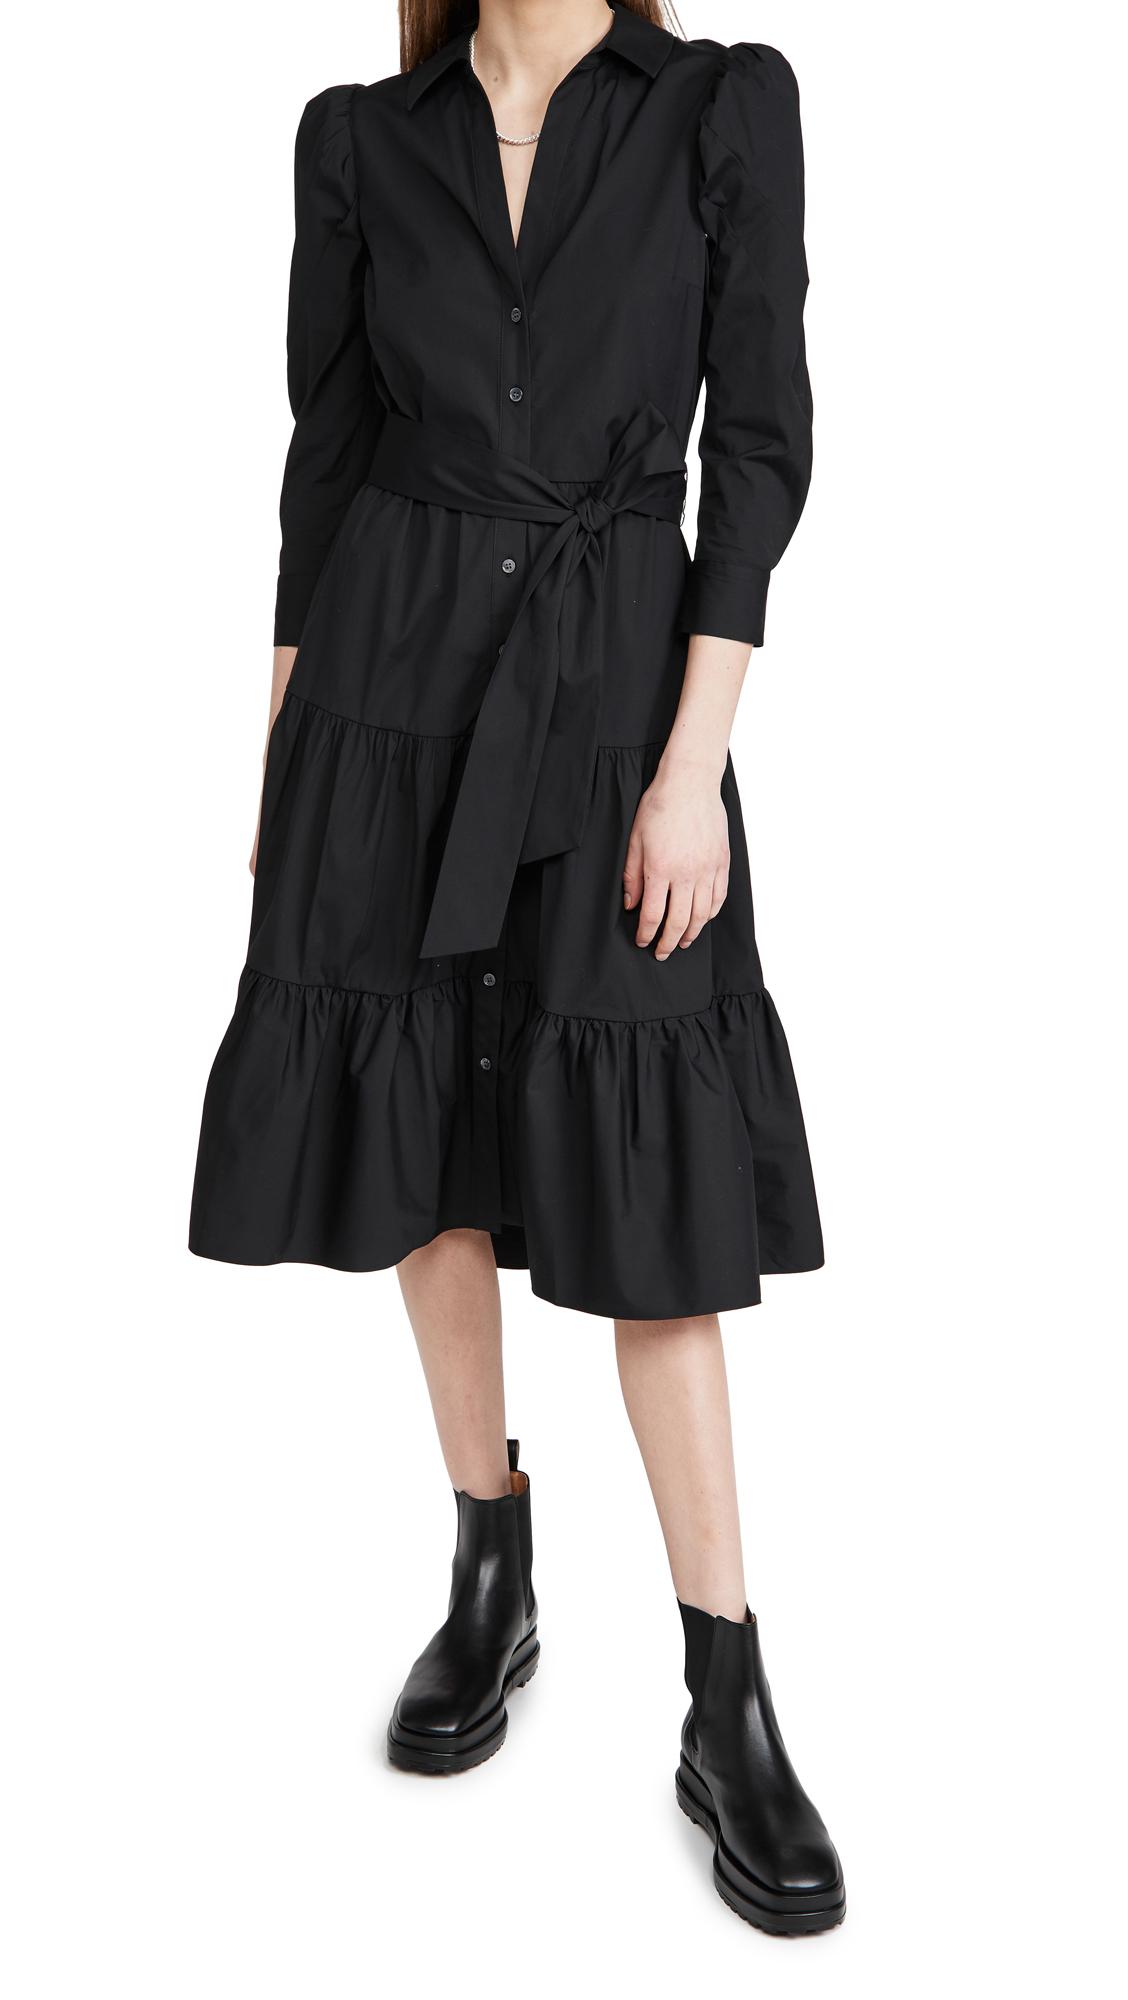 Veronica Beard Zeila Dress